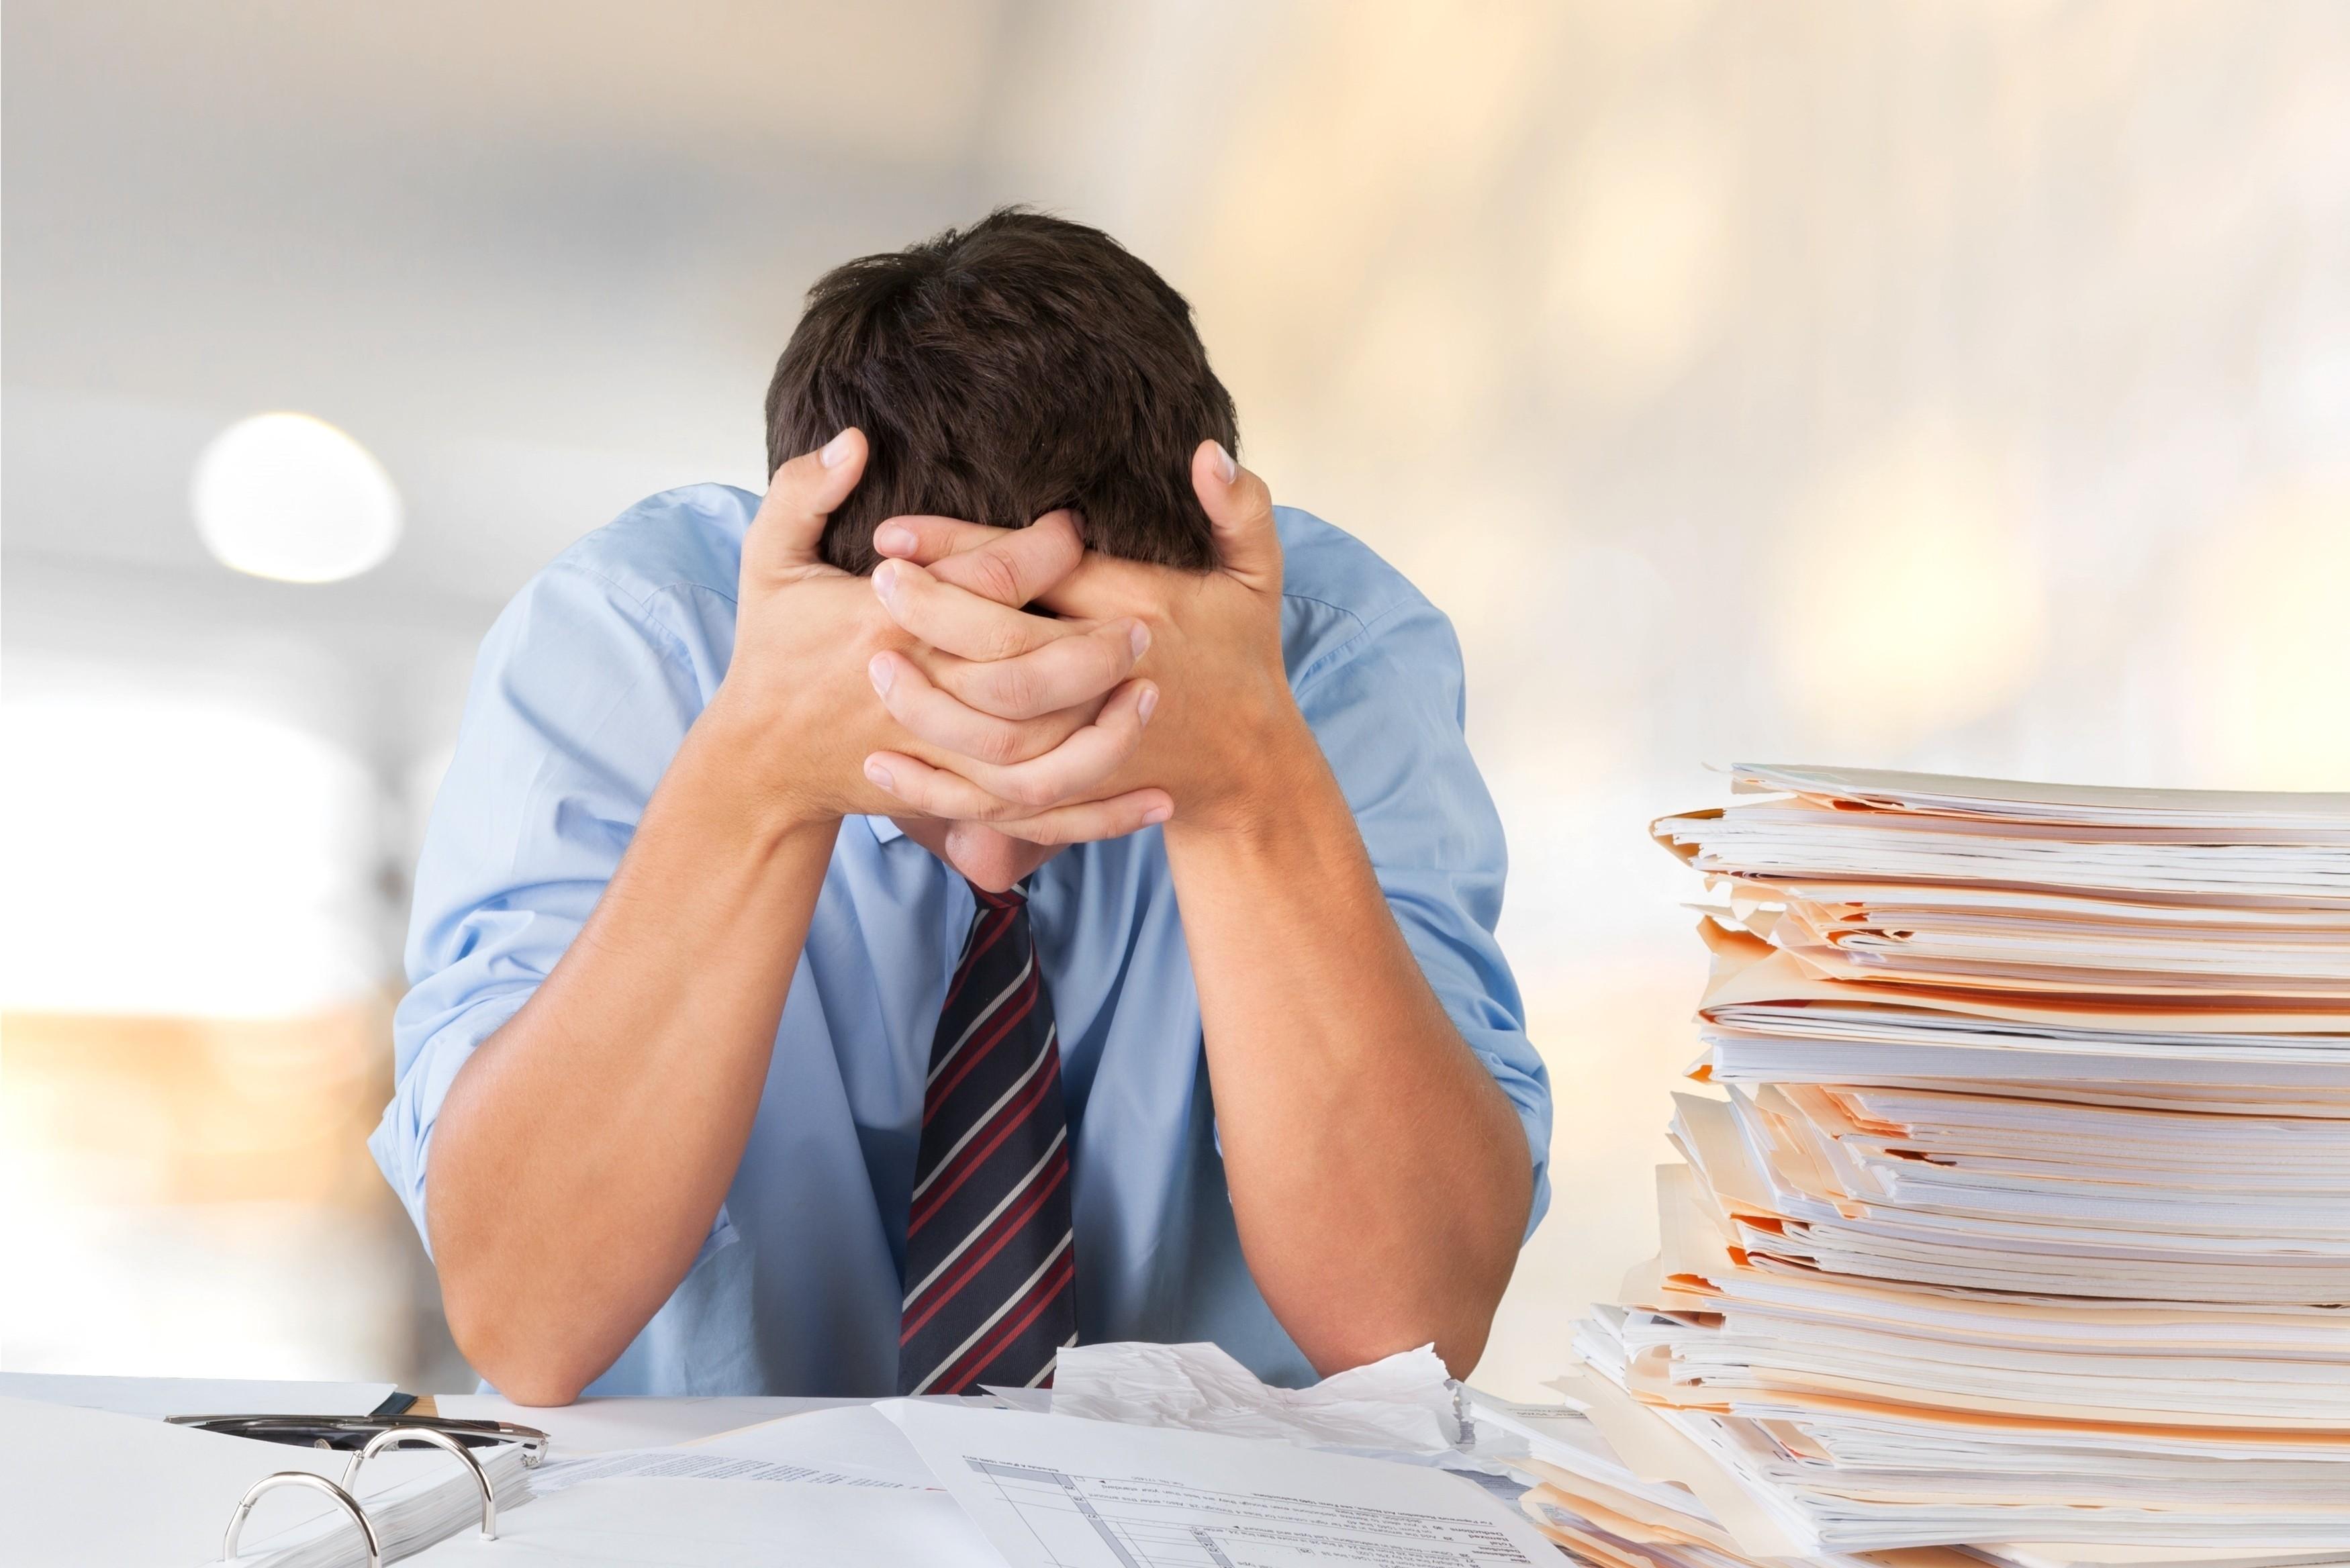 Muž ve stresu – zdroje stresu